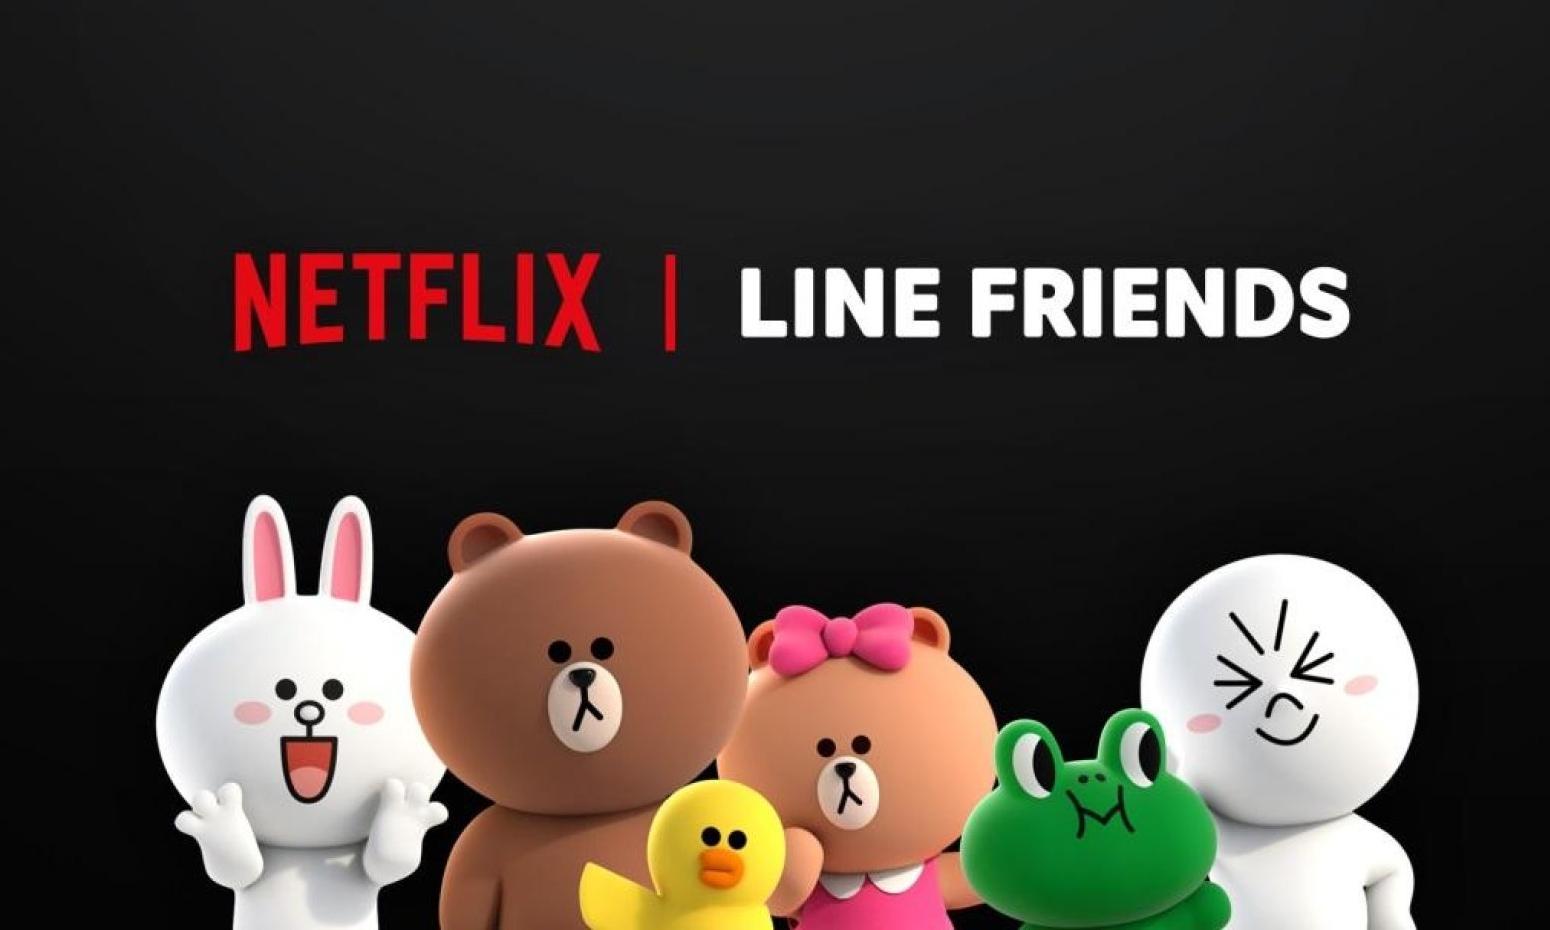 Netflix 将联合 Line Friends 推出原创动画系列